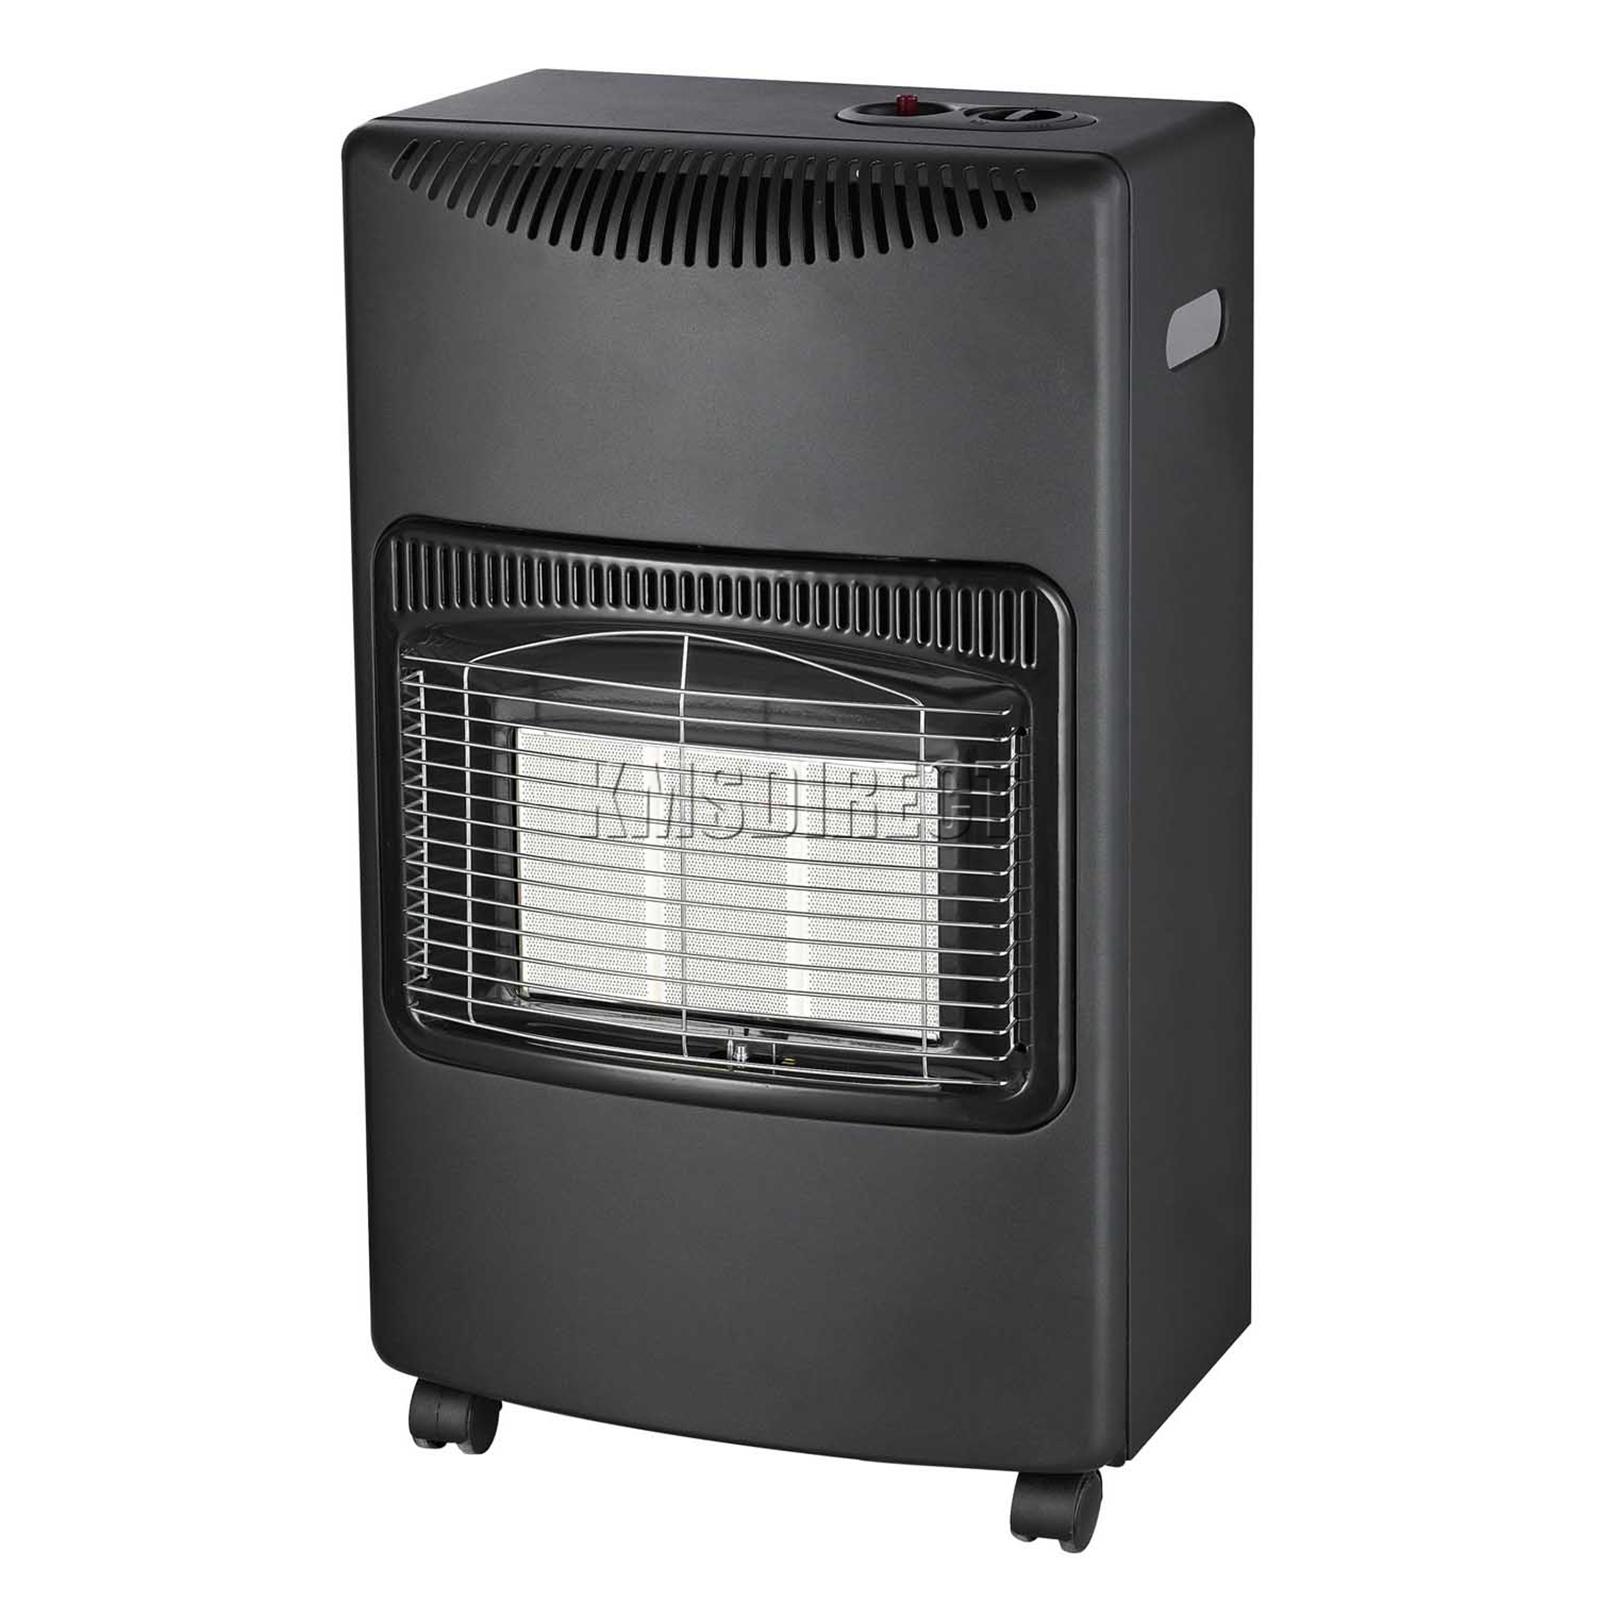 42Kw Portable Home Butane Fire Calor Gas Cabinet Heater With Regulator Hose New